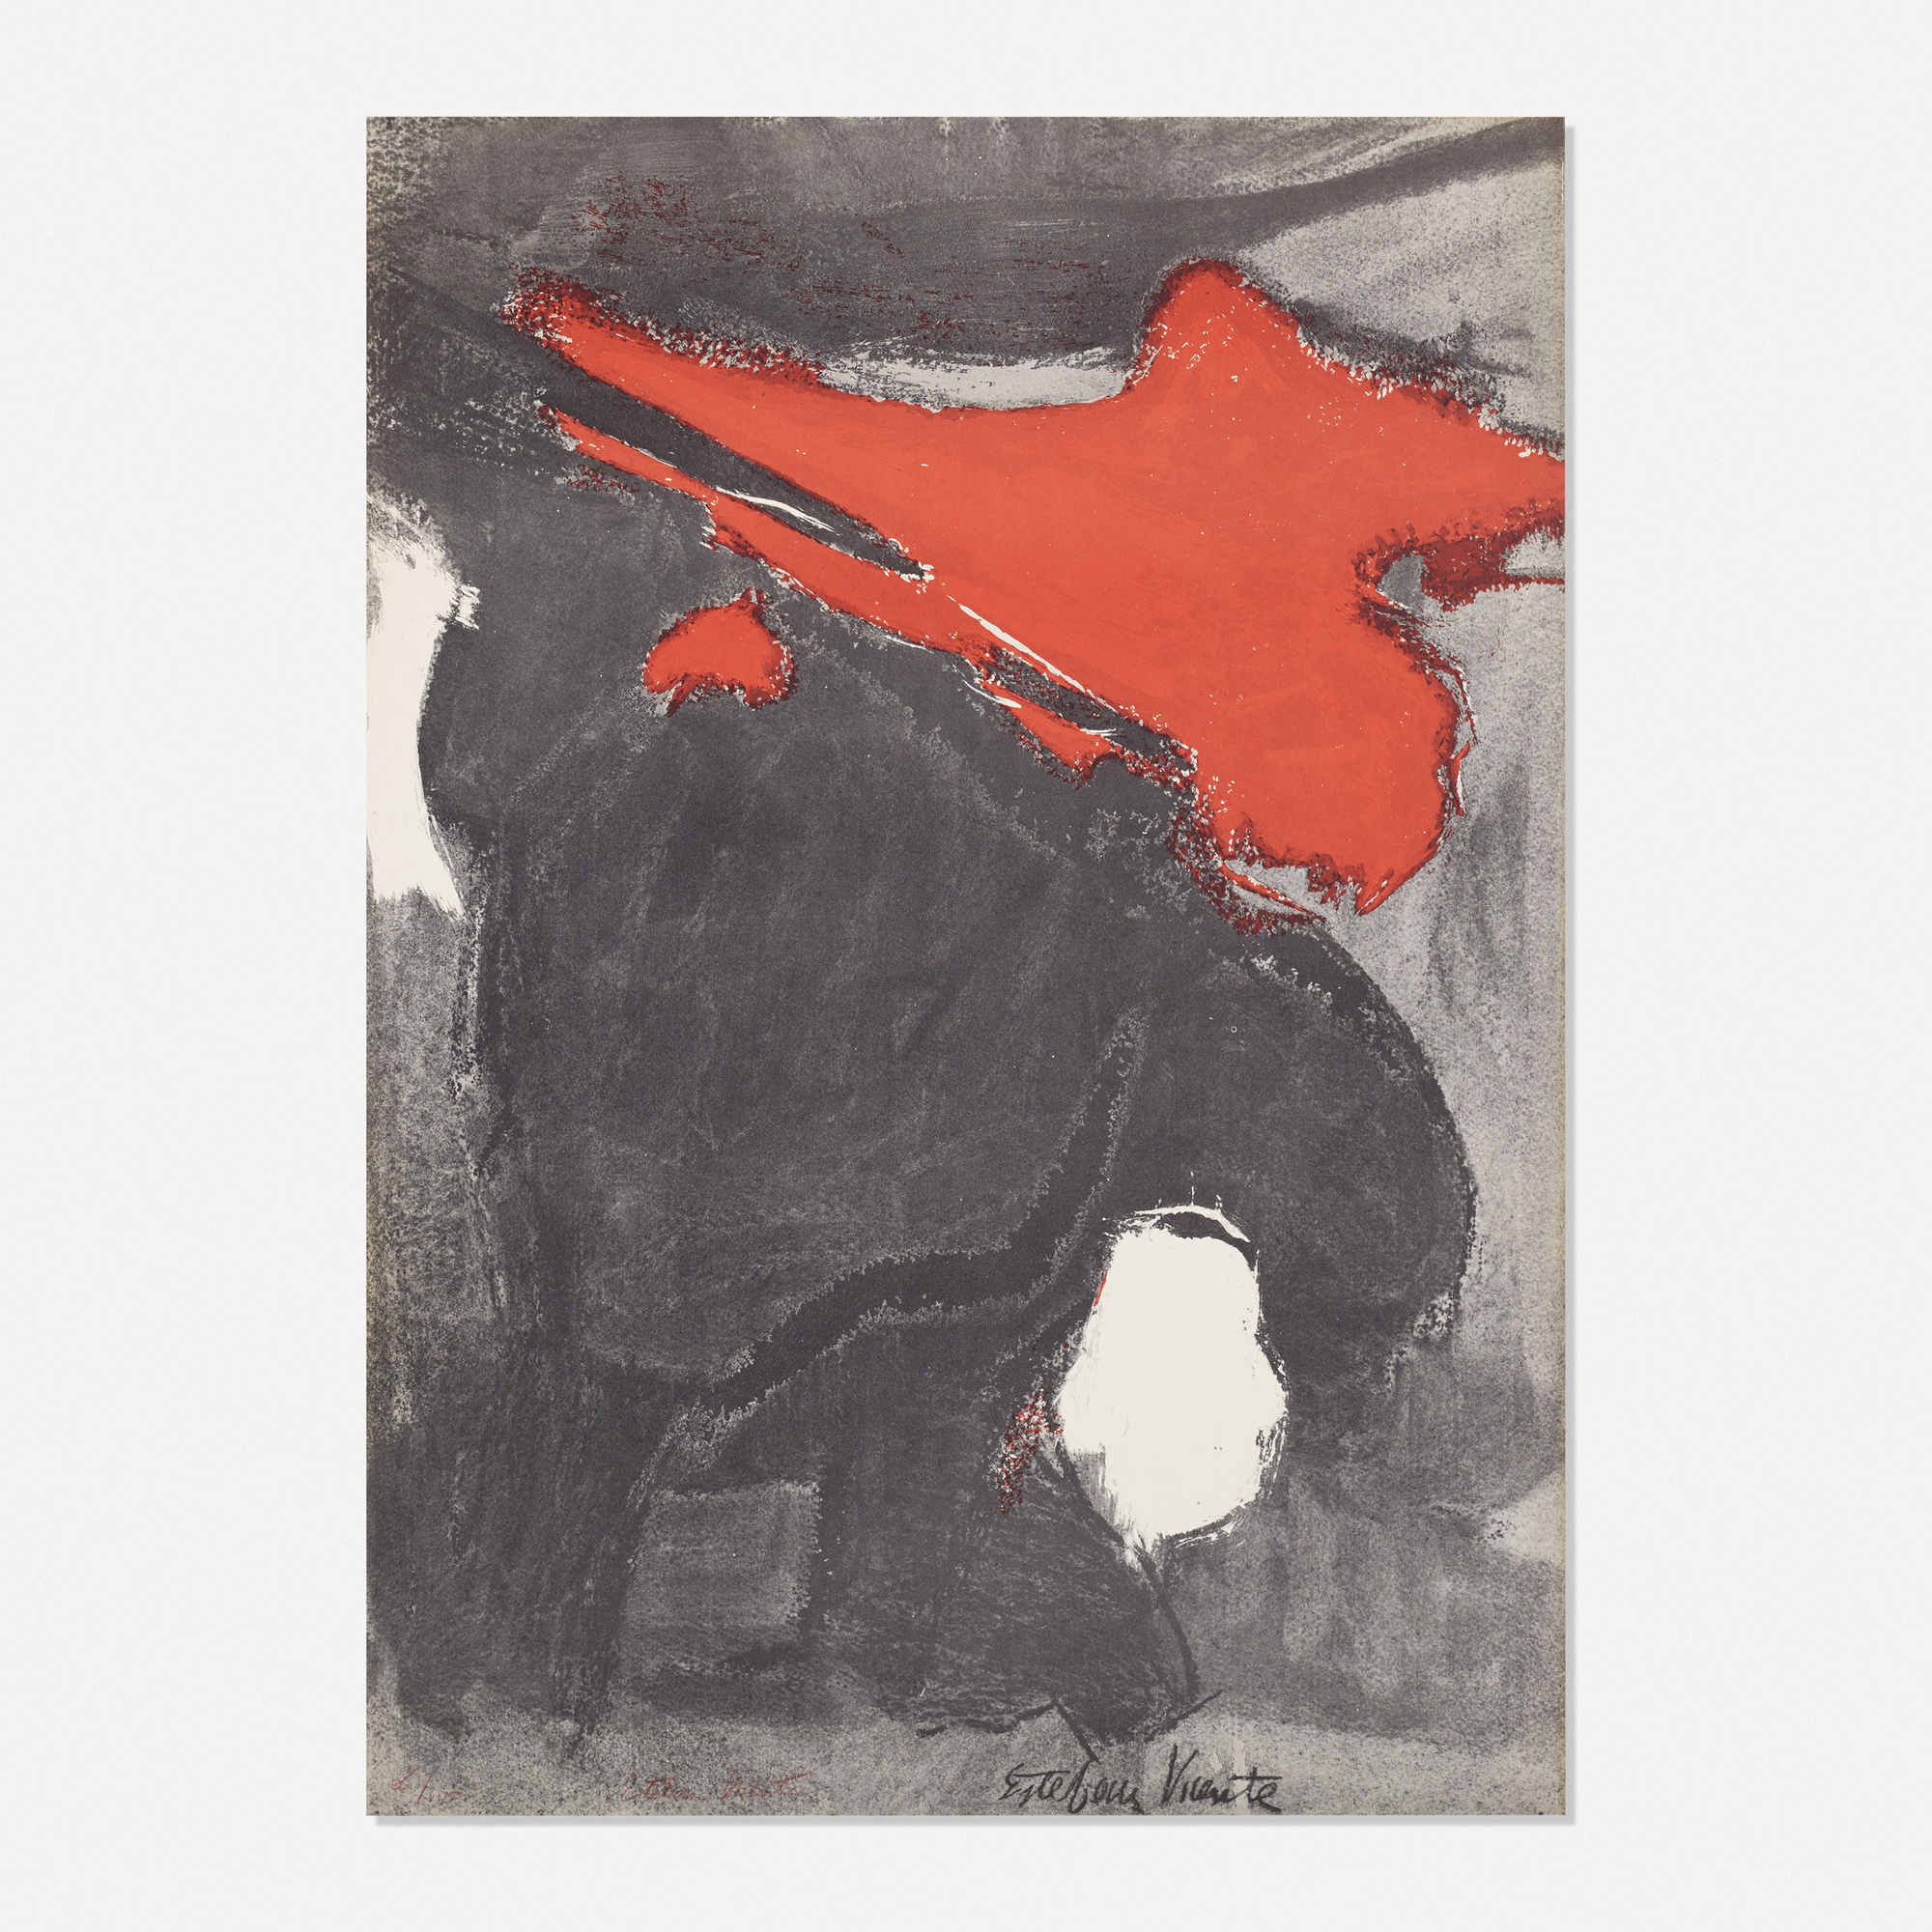 167: Esteban Vicente / Untitled (1 of 1)